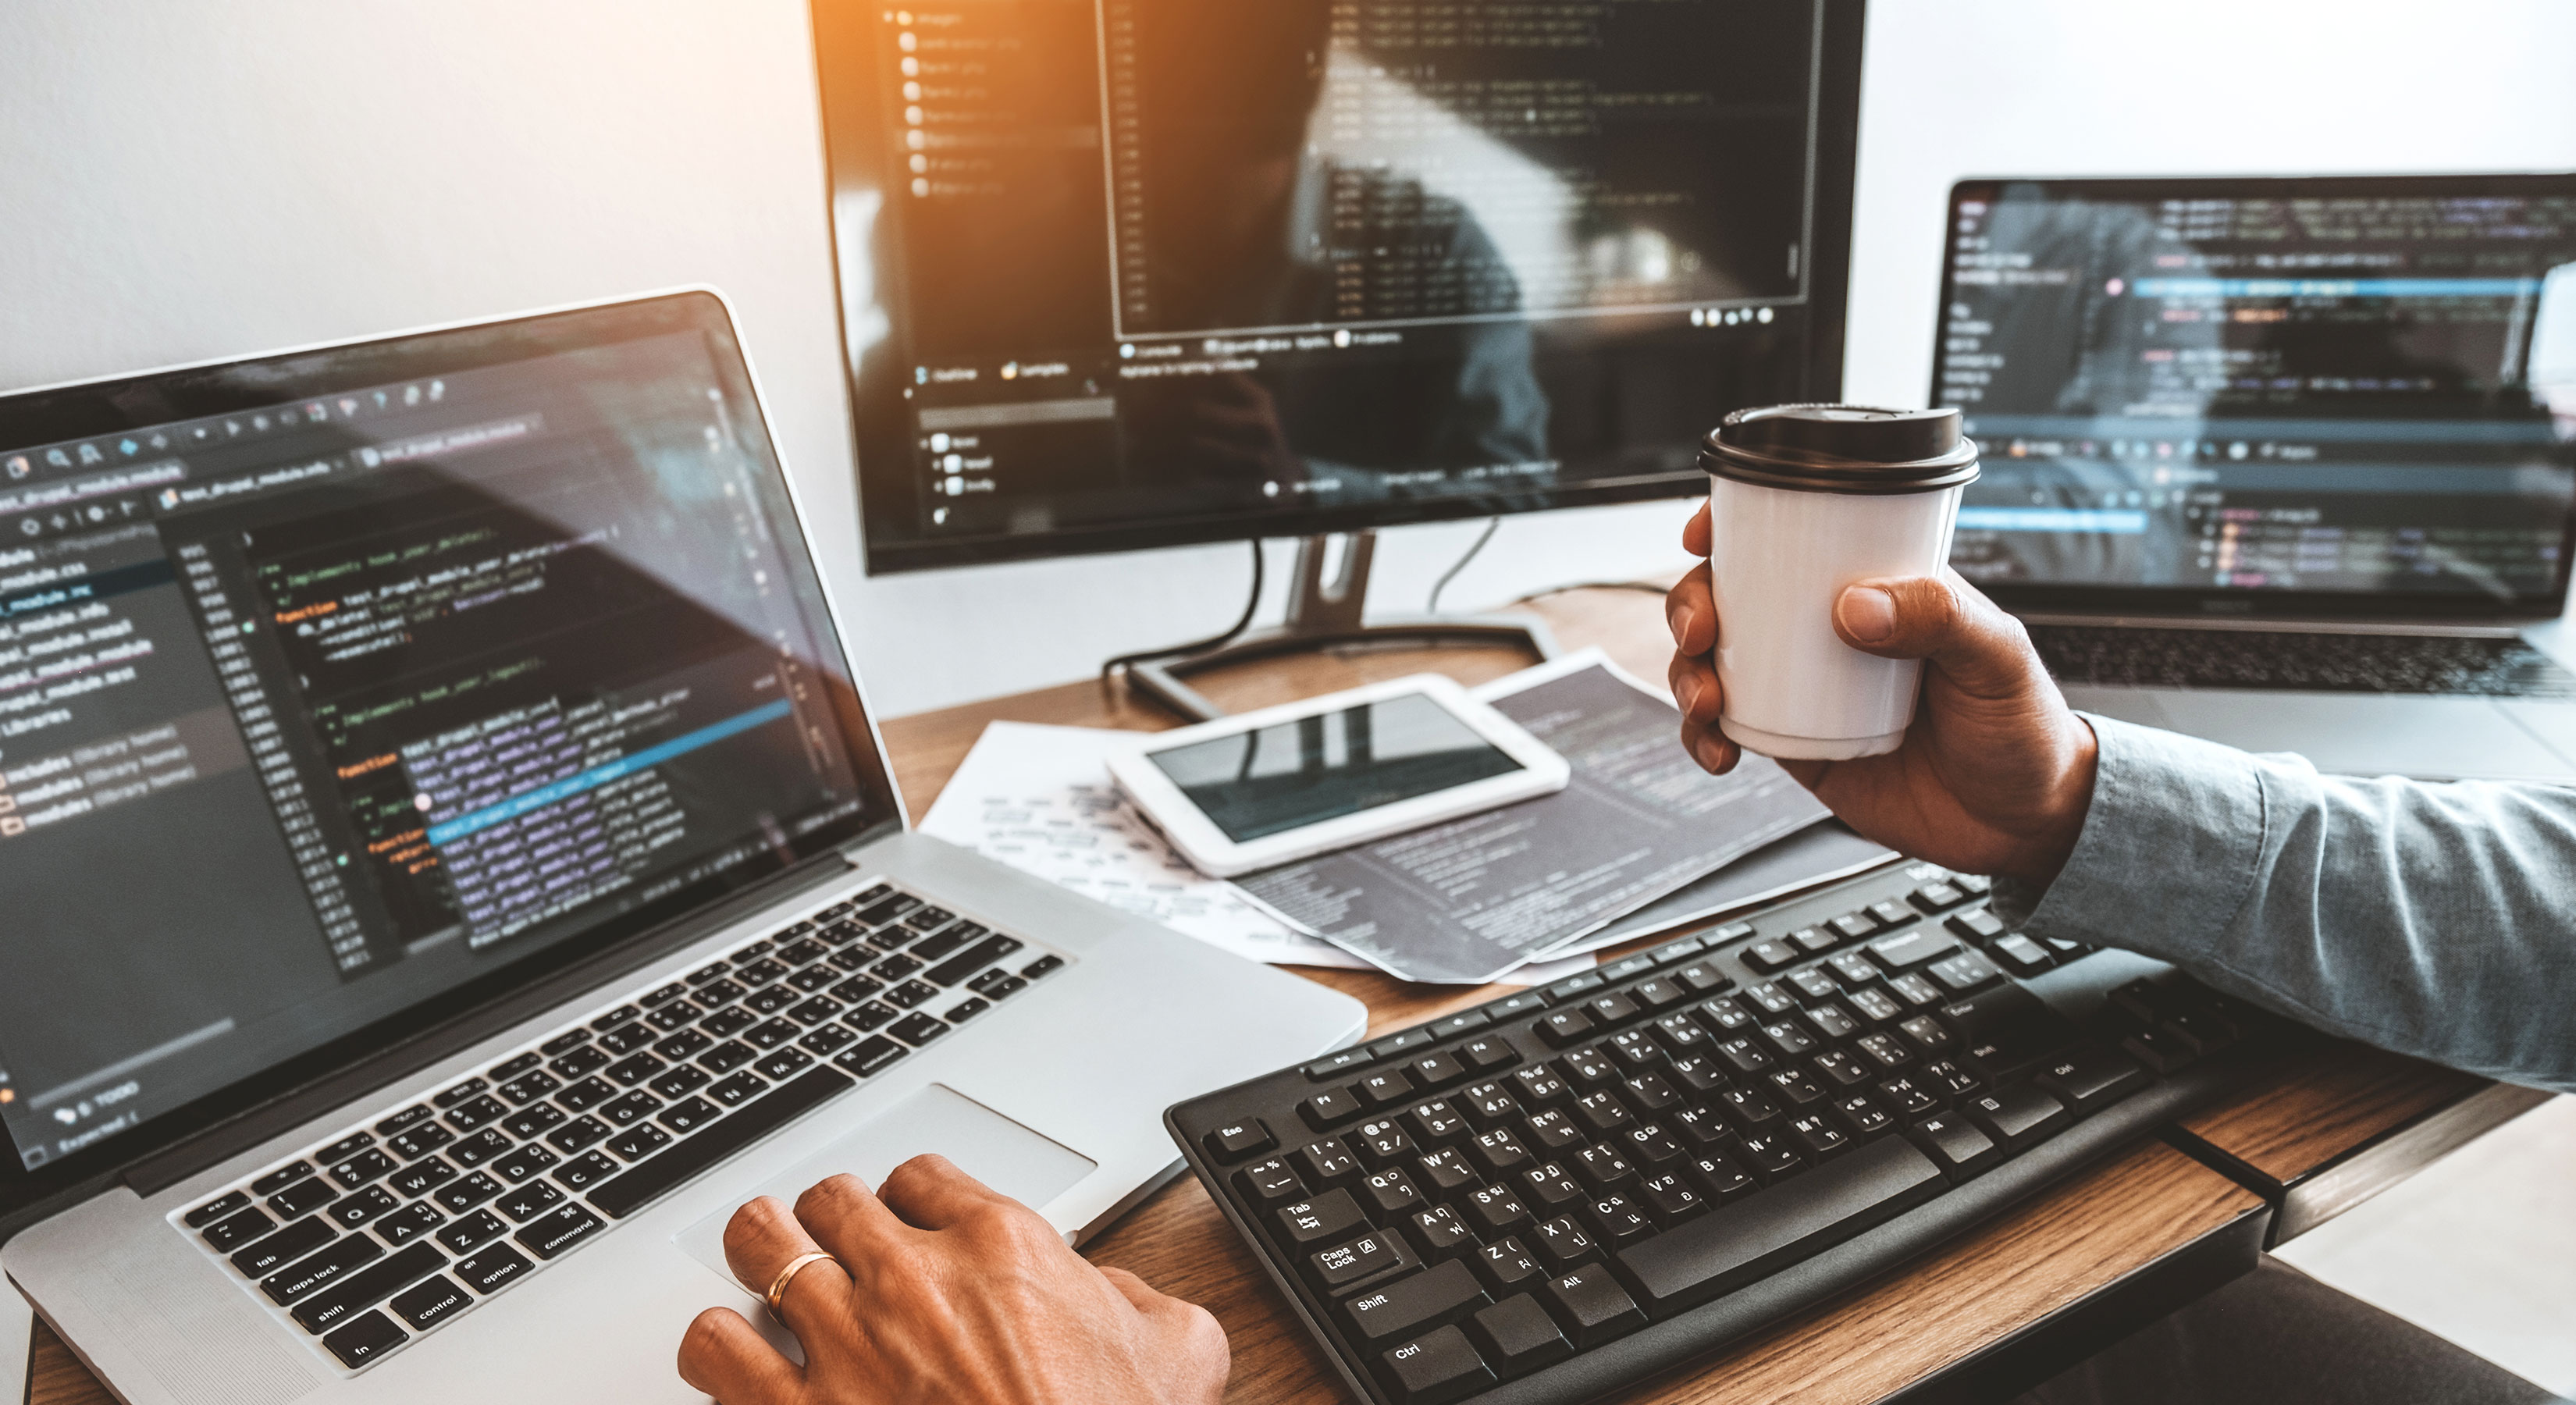 Frontline - Website Development Services - What Does a Java Developer Do?